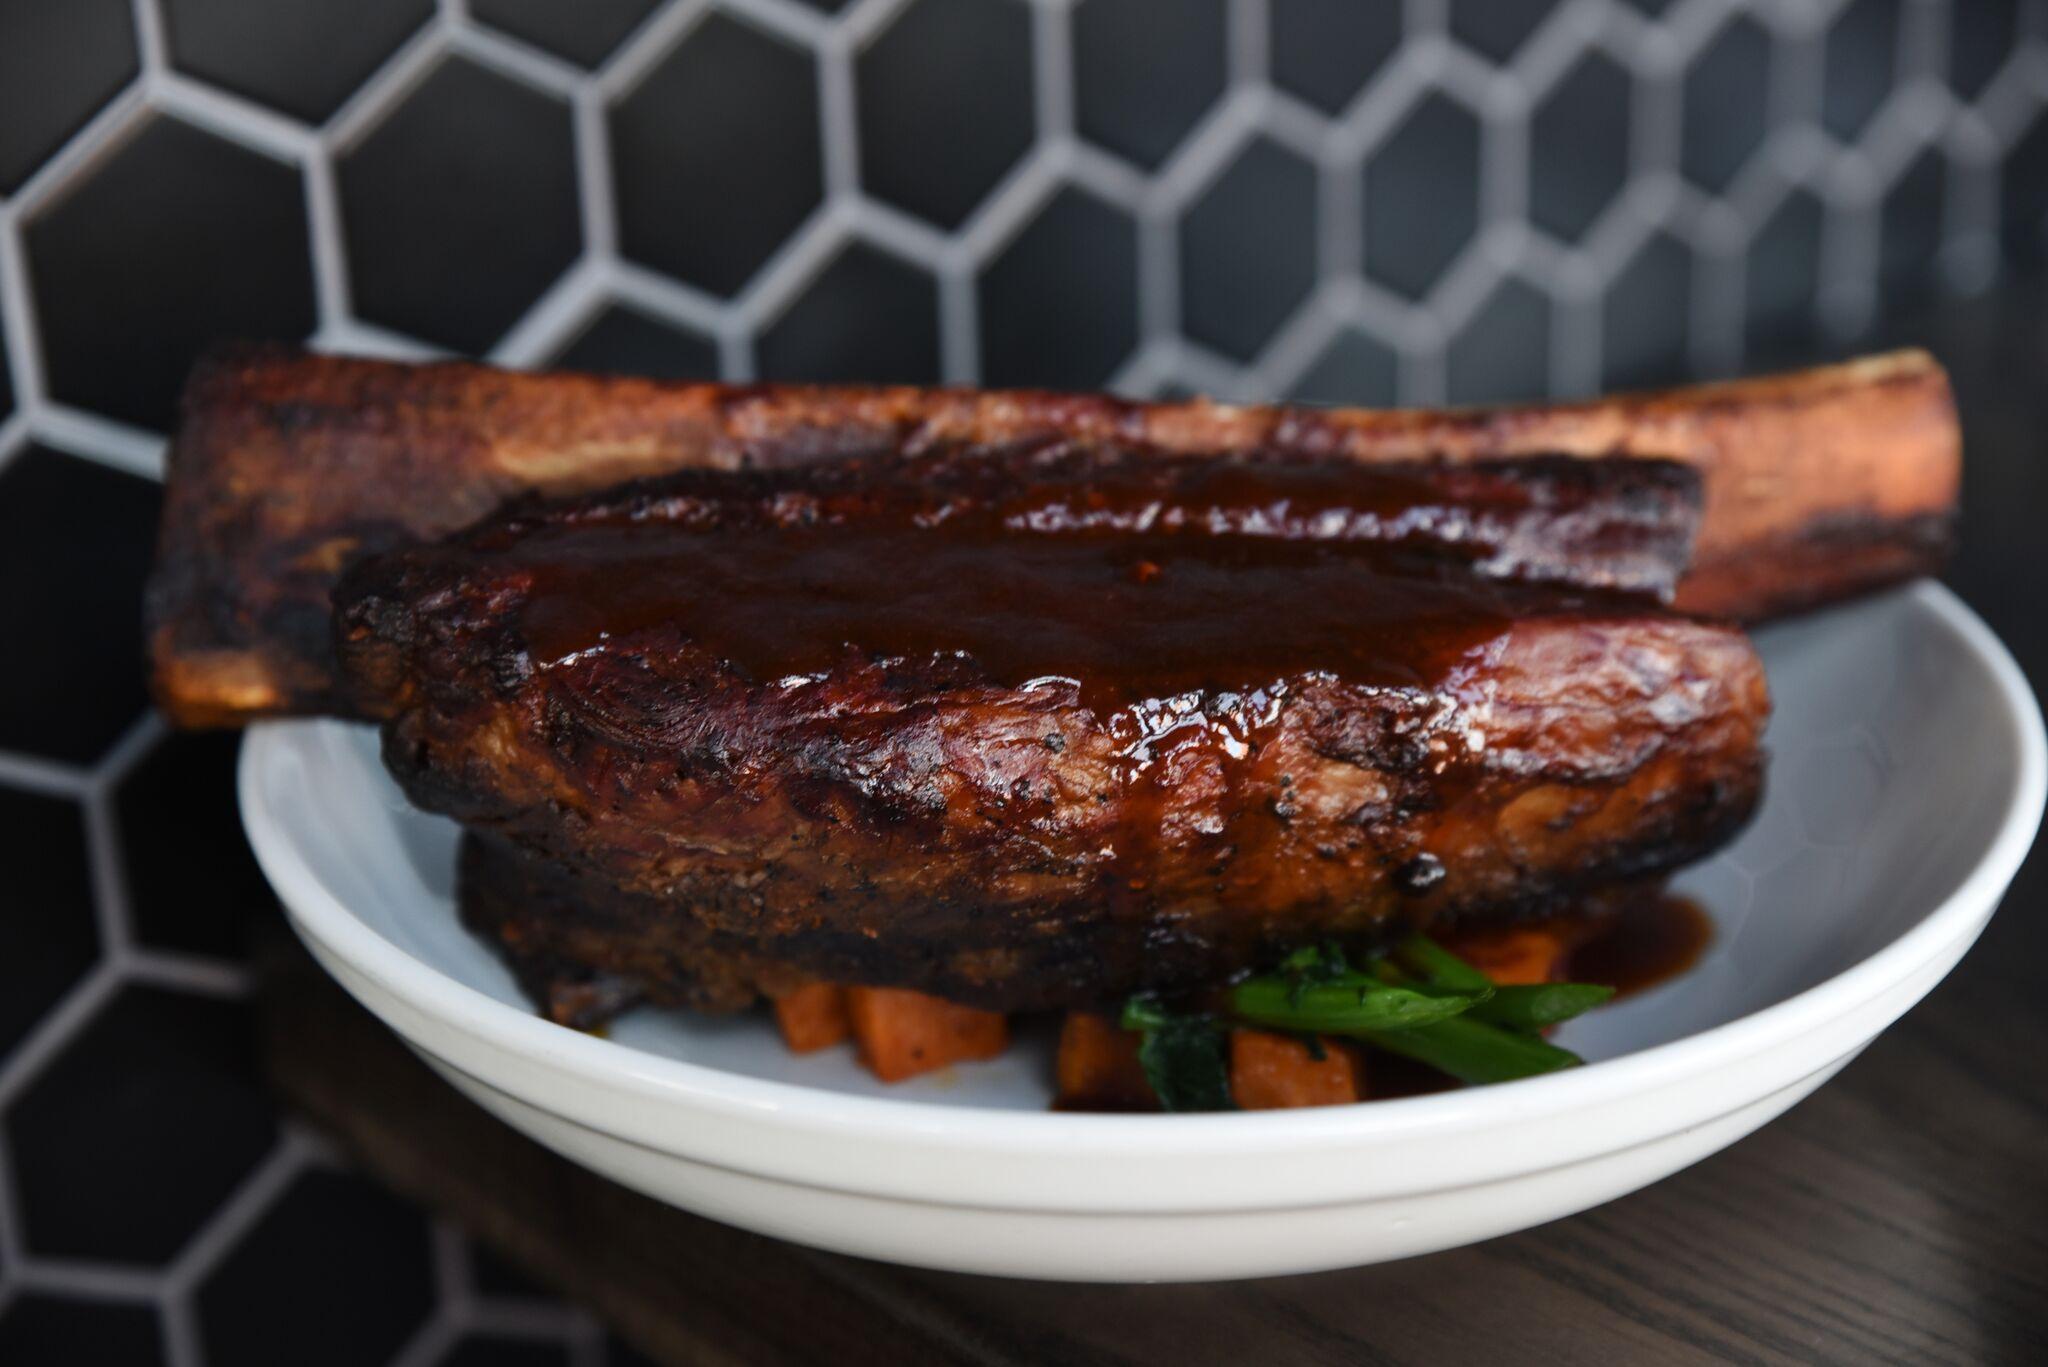 Braised Bone-In Beef Short Rib